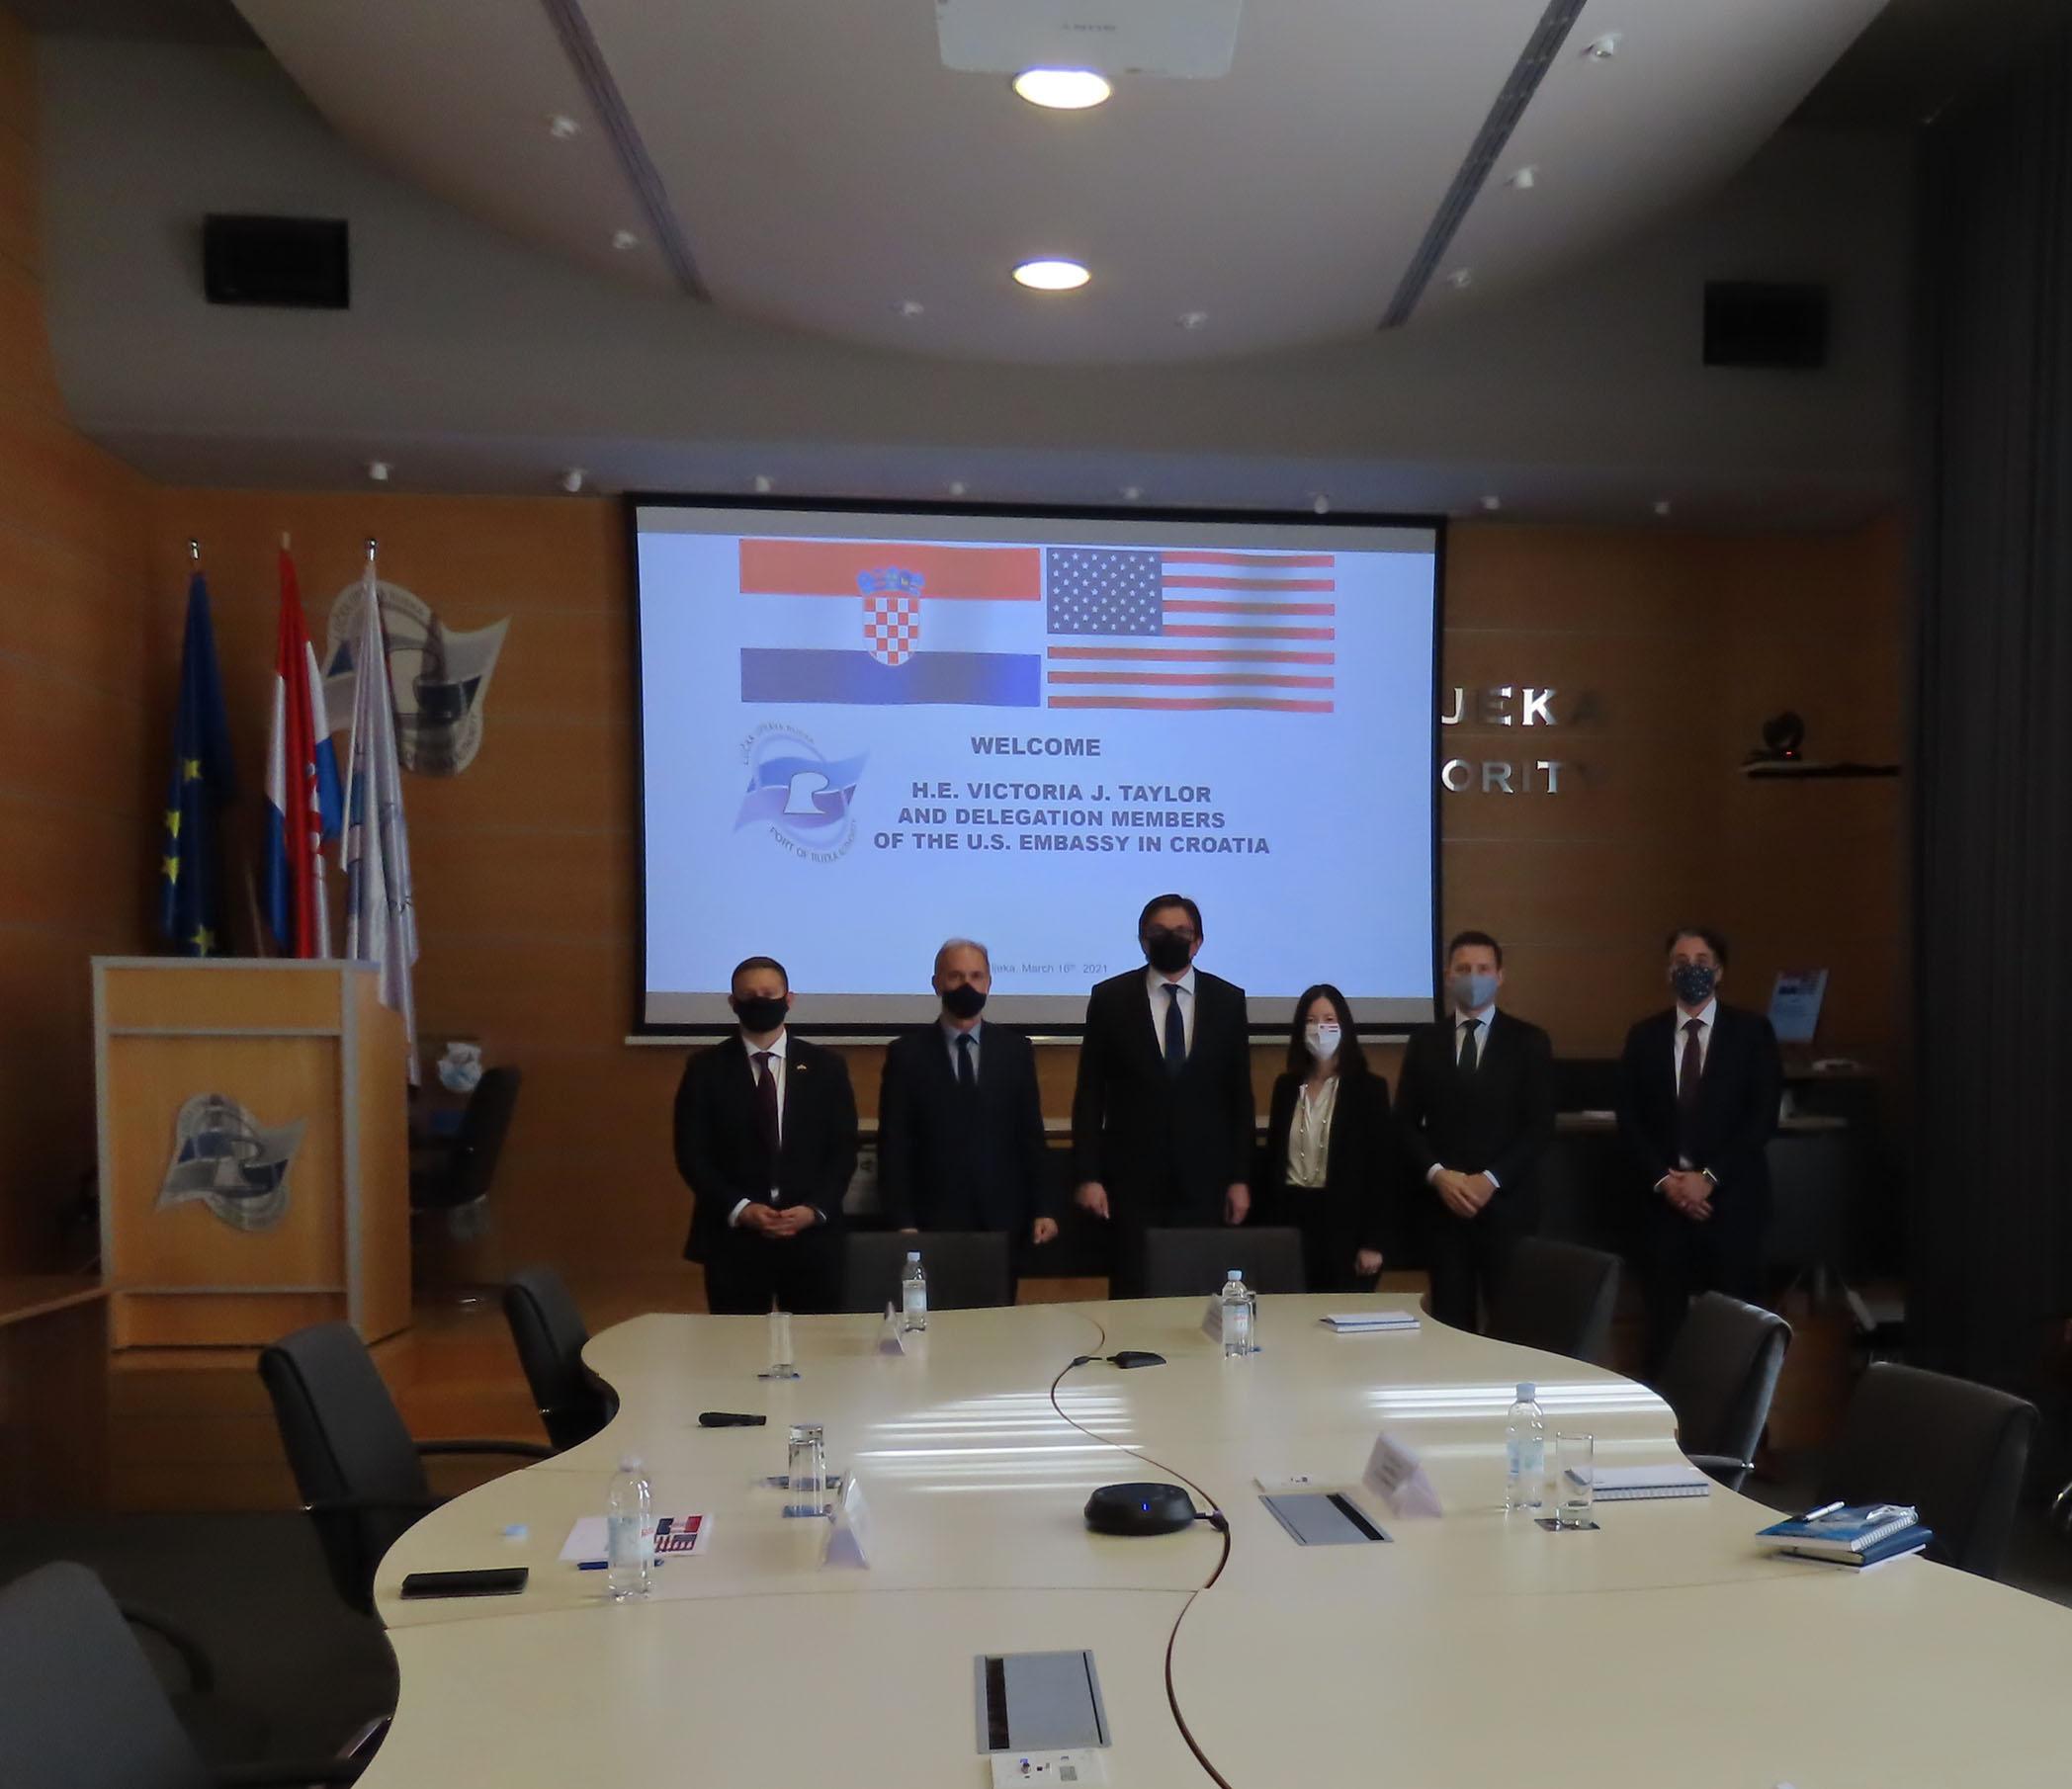 Visit of the U.S.Embassy in Croatia